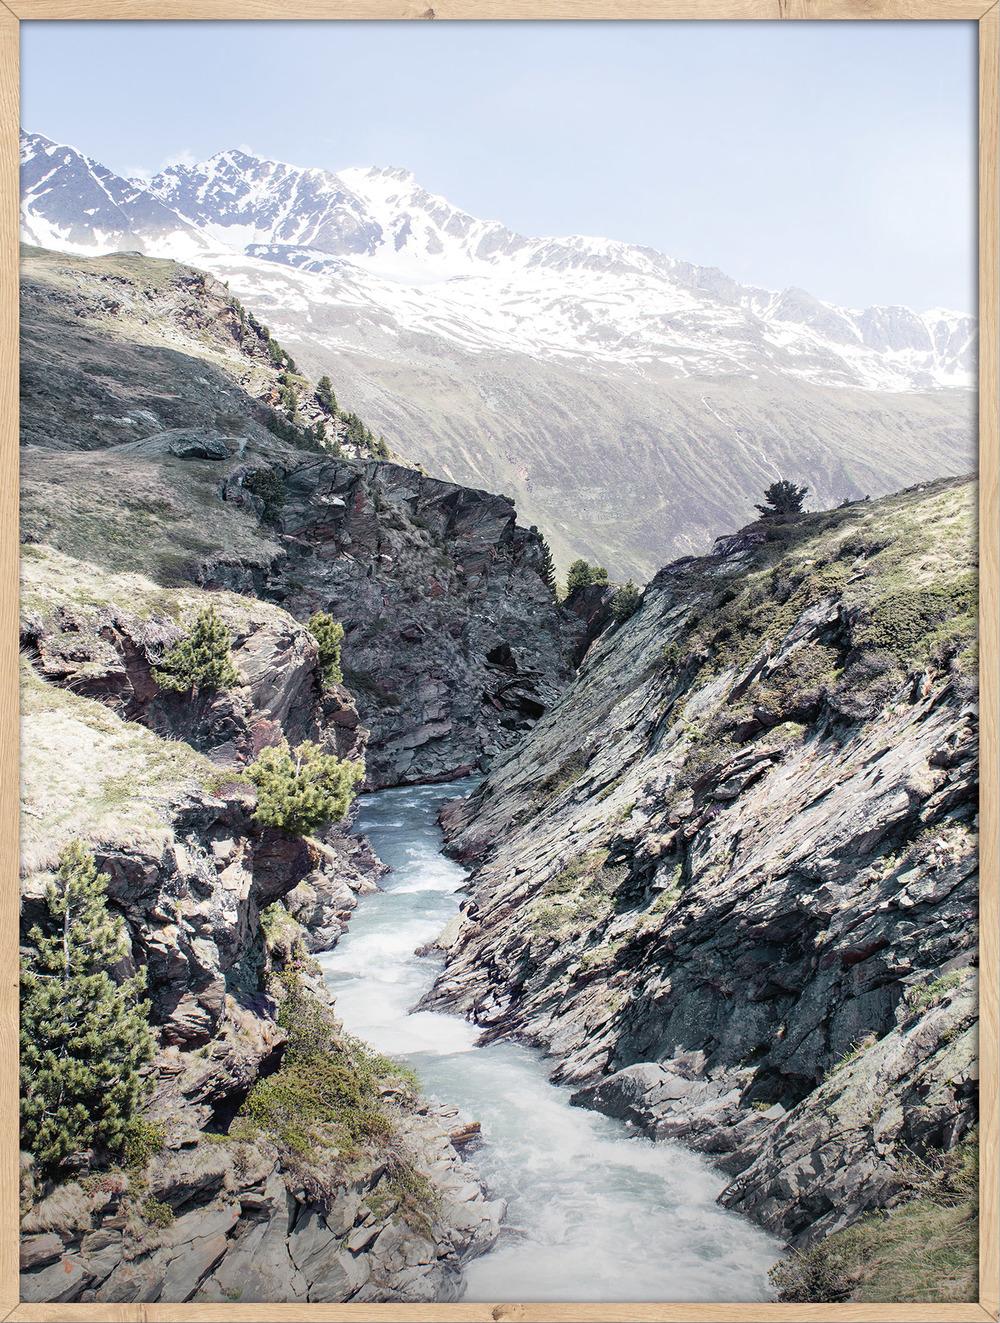 Bildergalerie_Alpenfluss.jpg